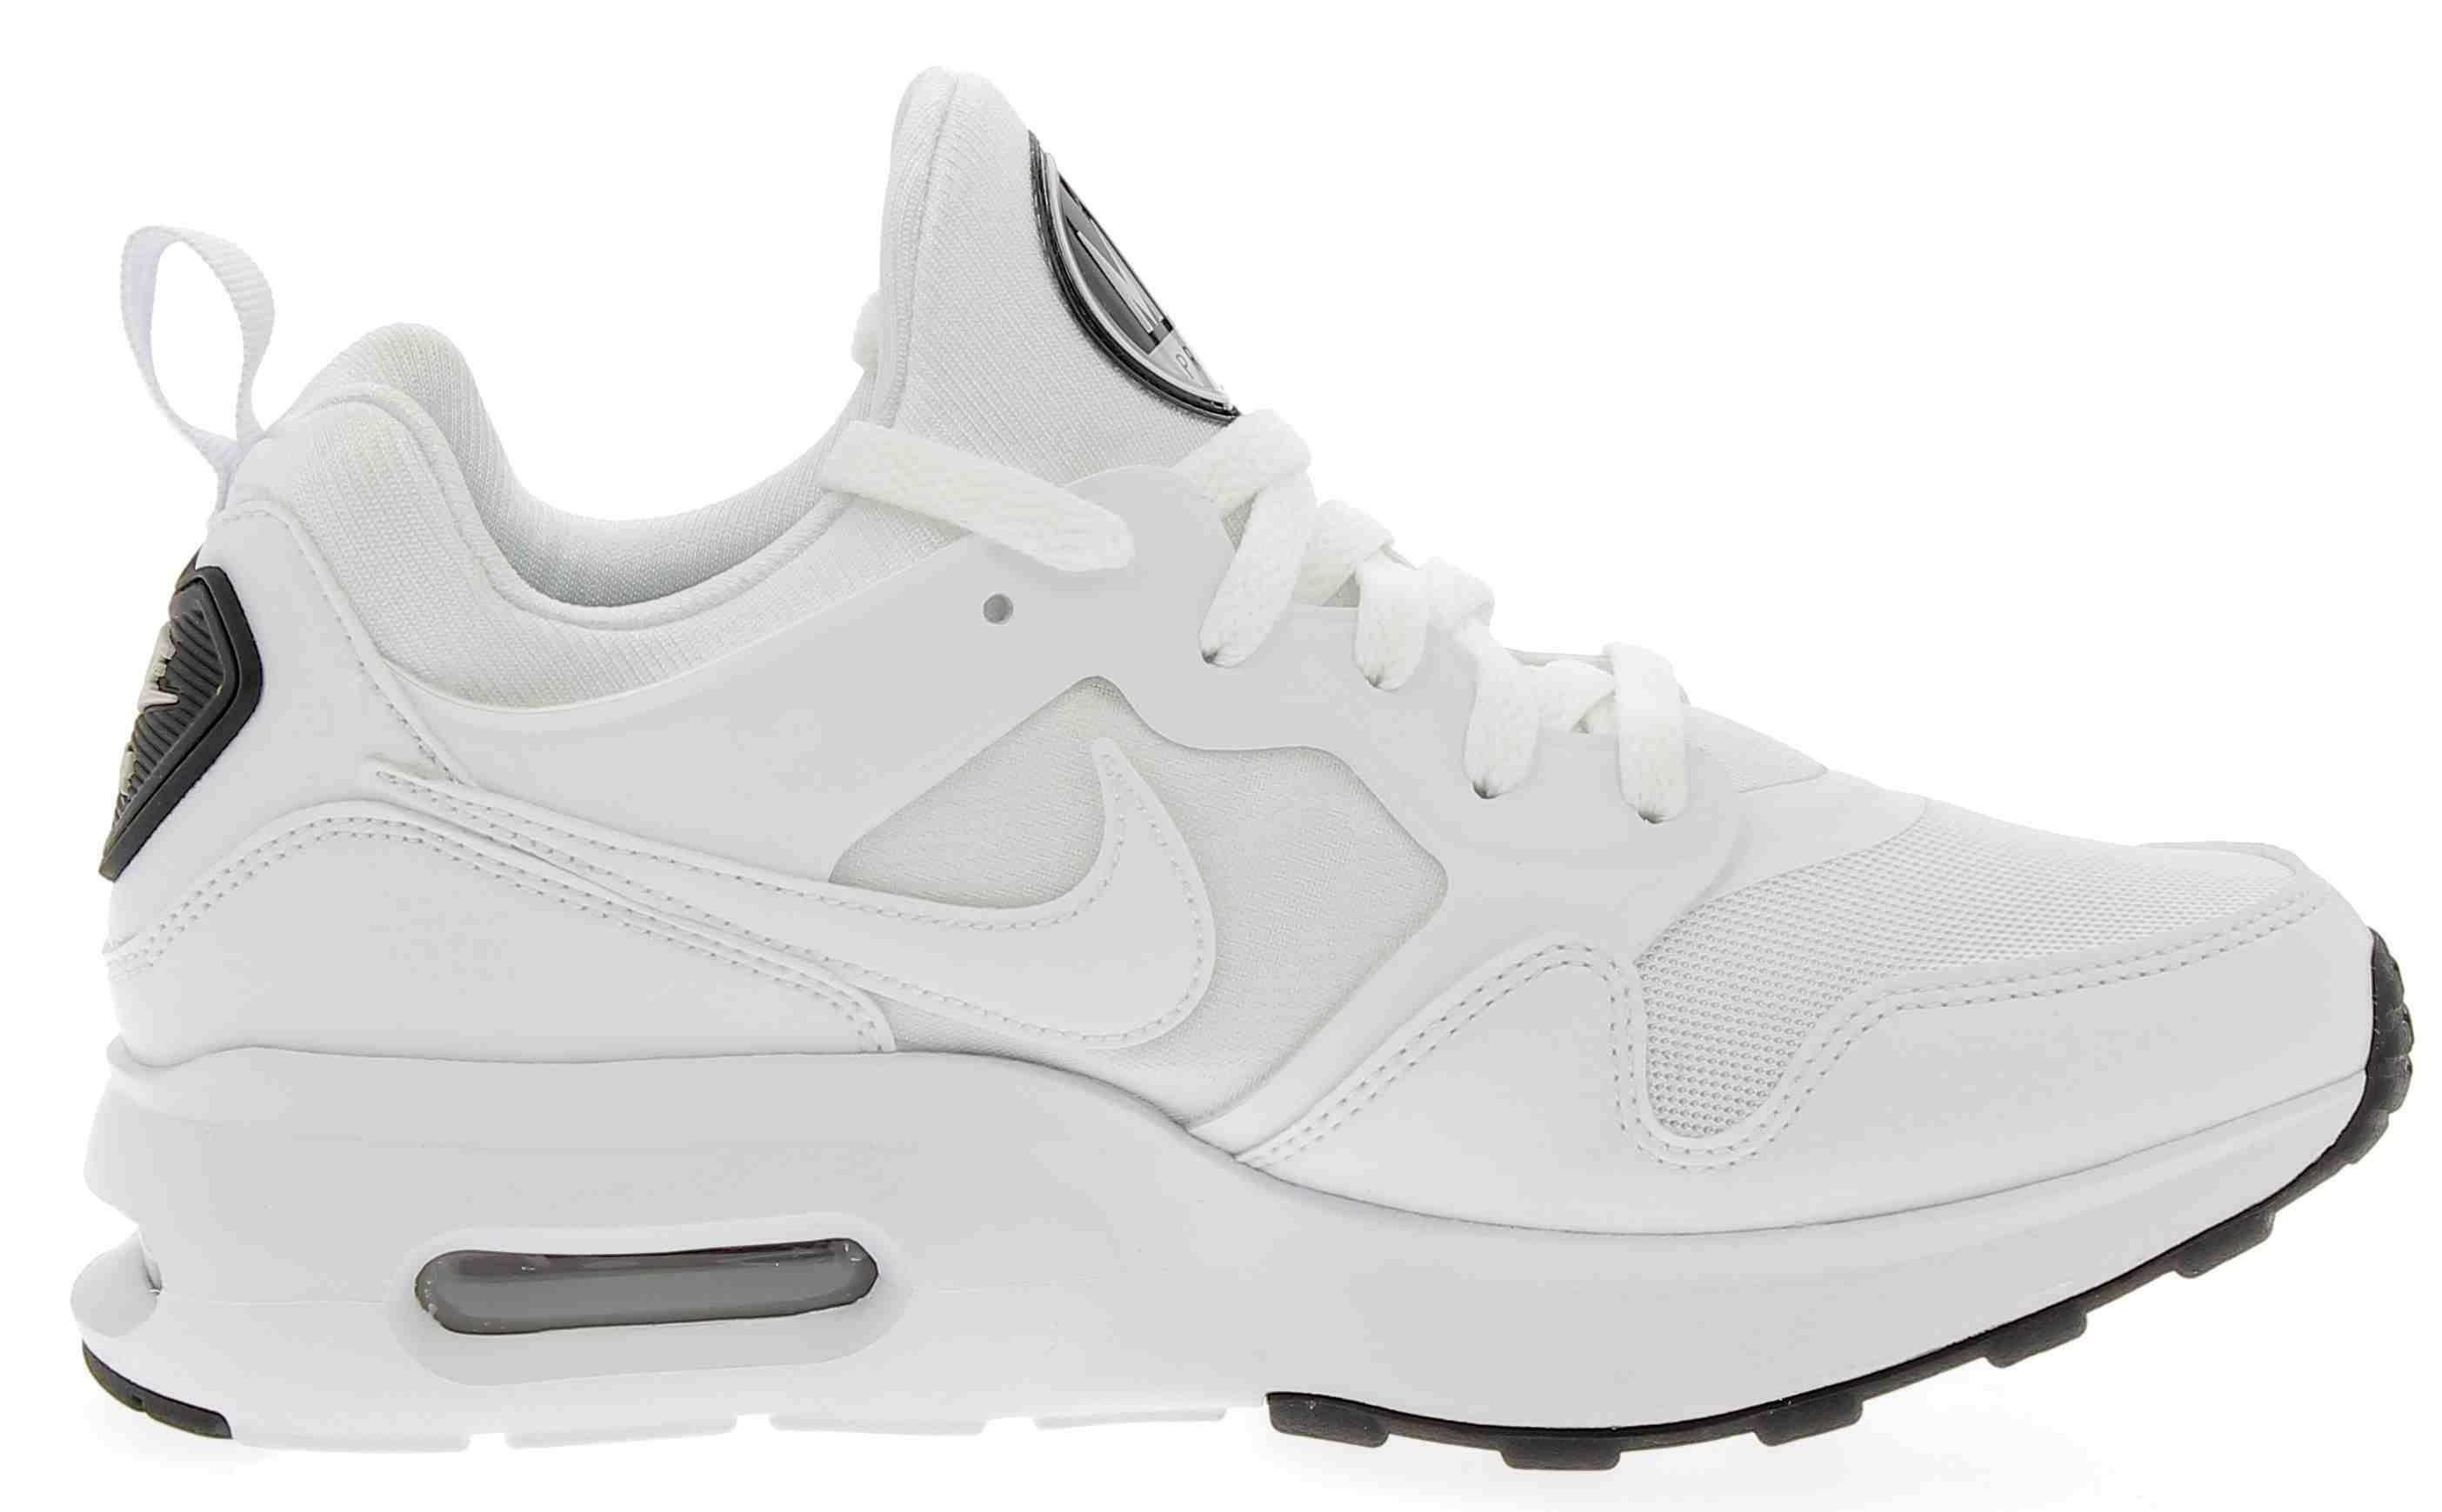 nike nike air max prime scarpe sportive uomo bianche